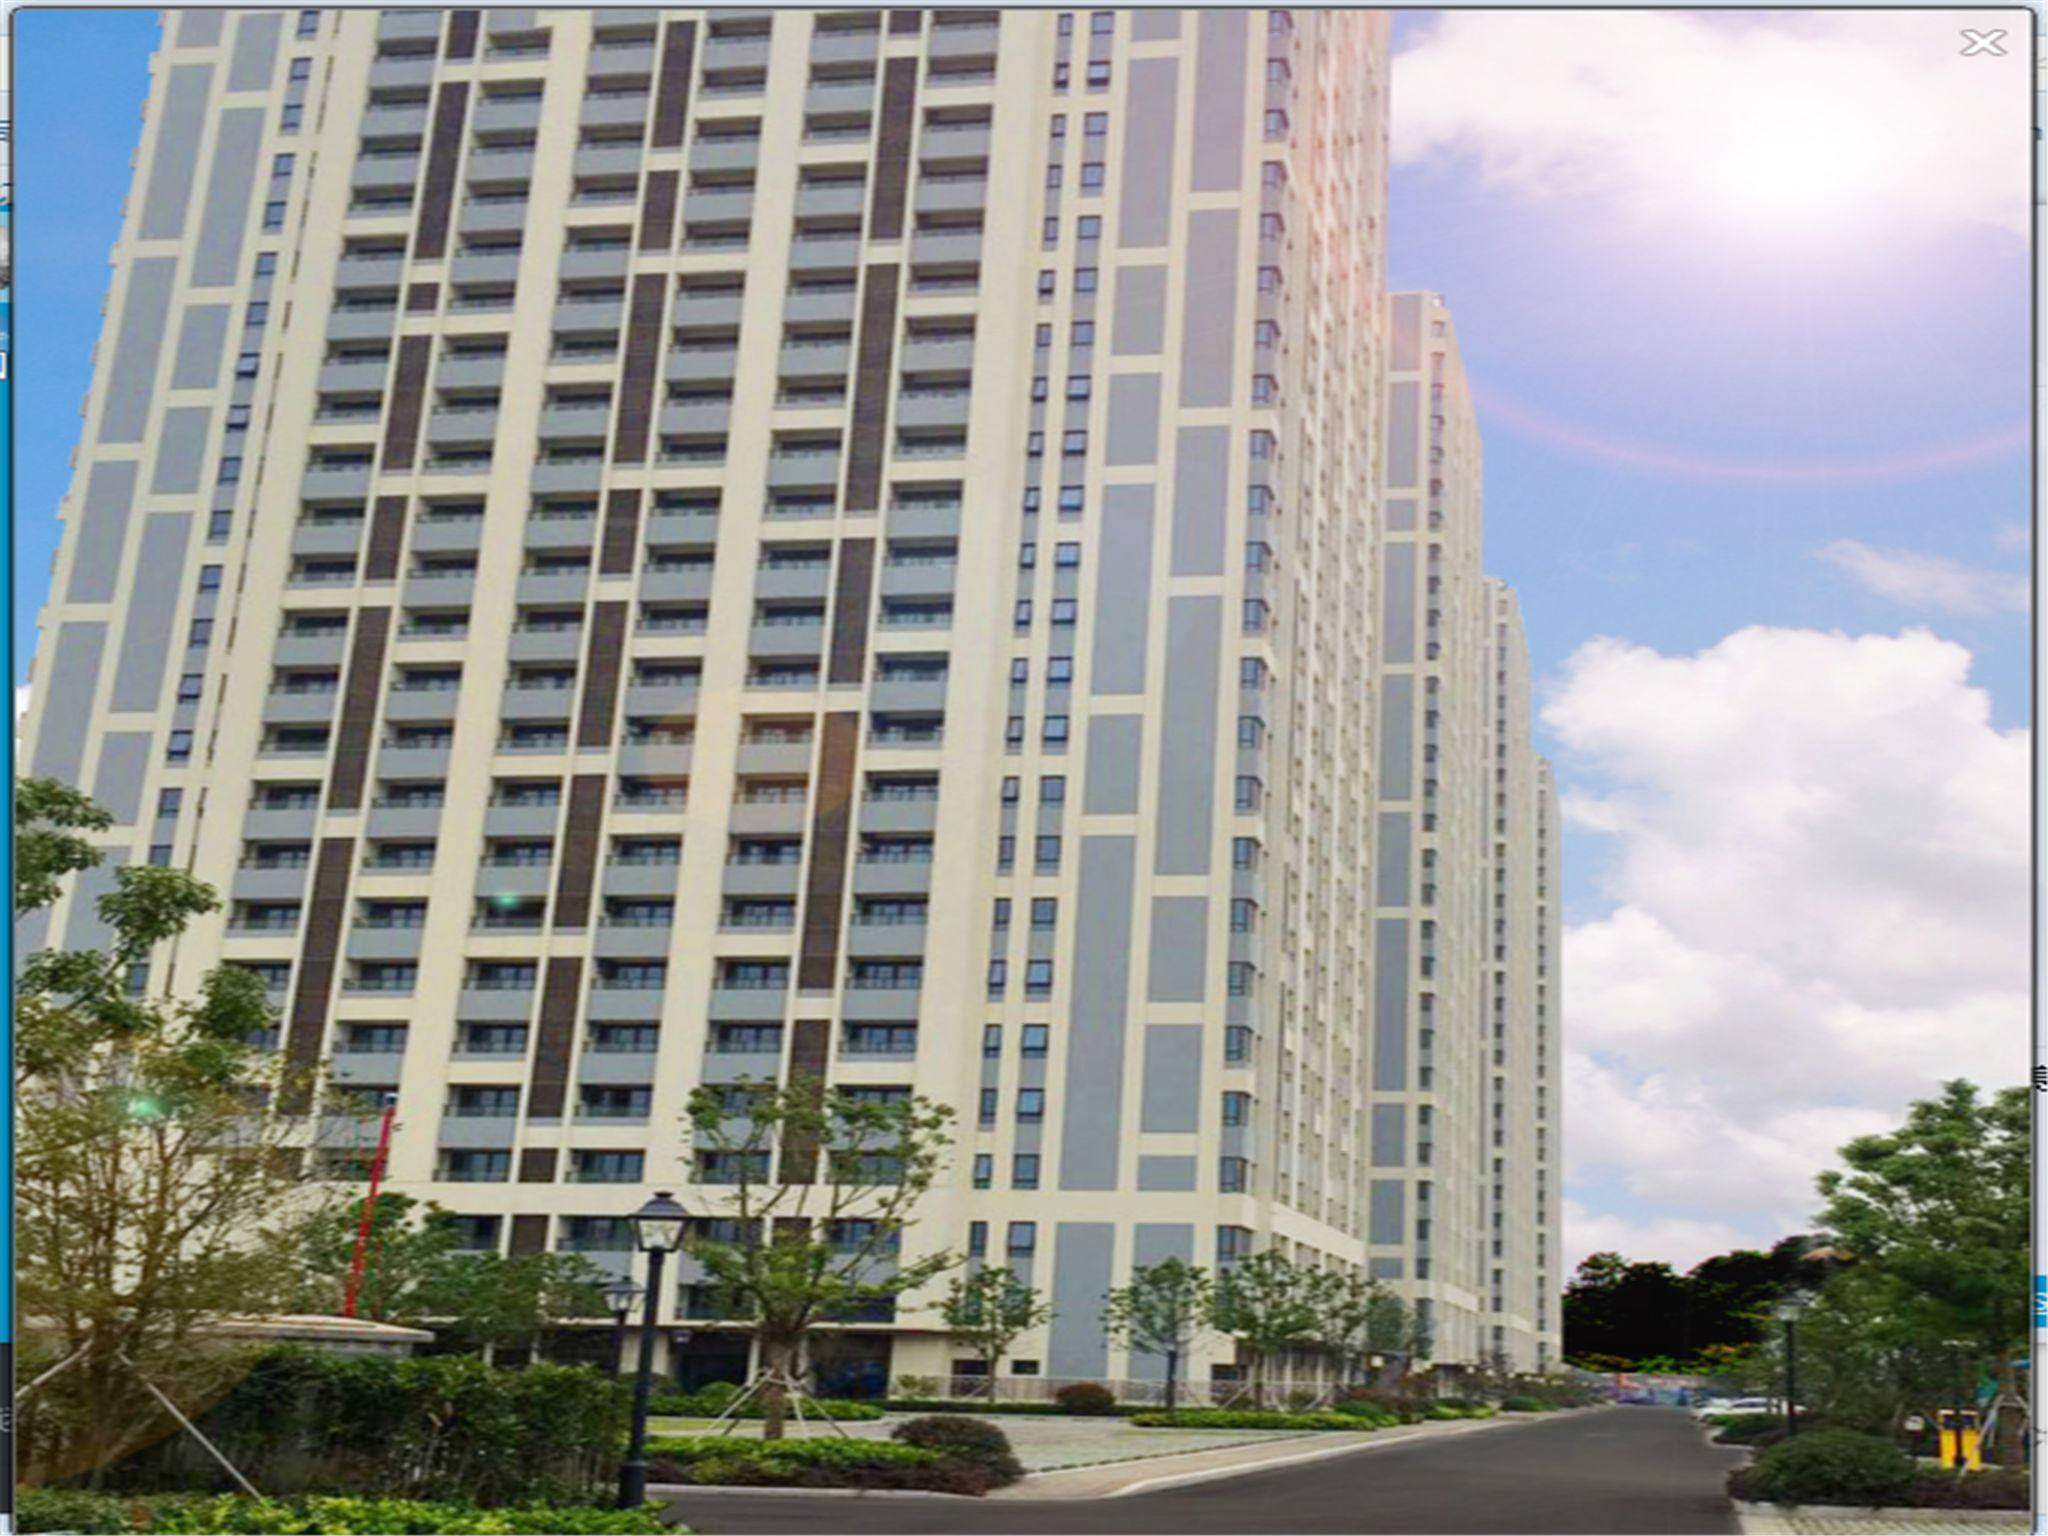 Bedom Apartments Wanda Taihu Yuexi Wuxi